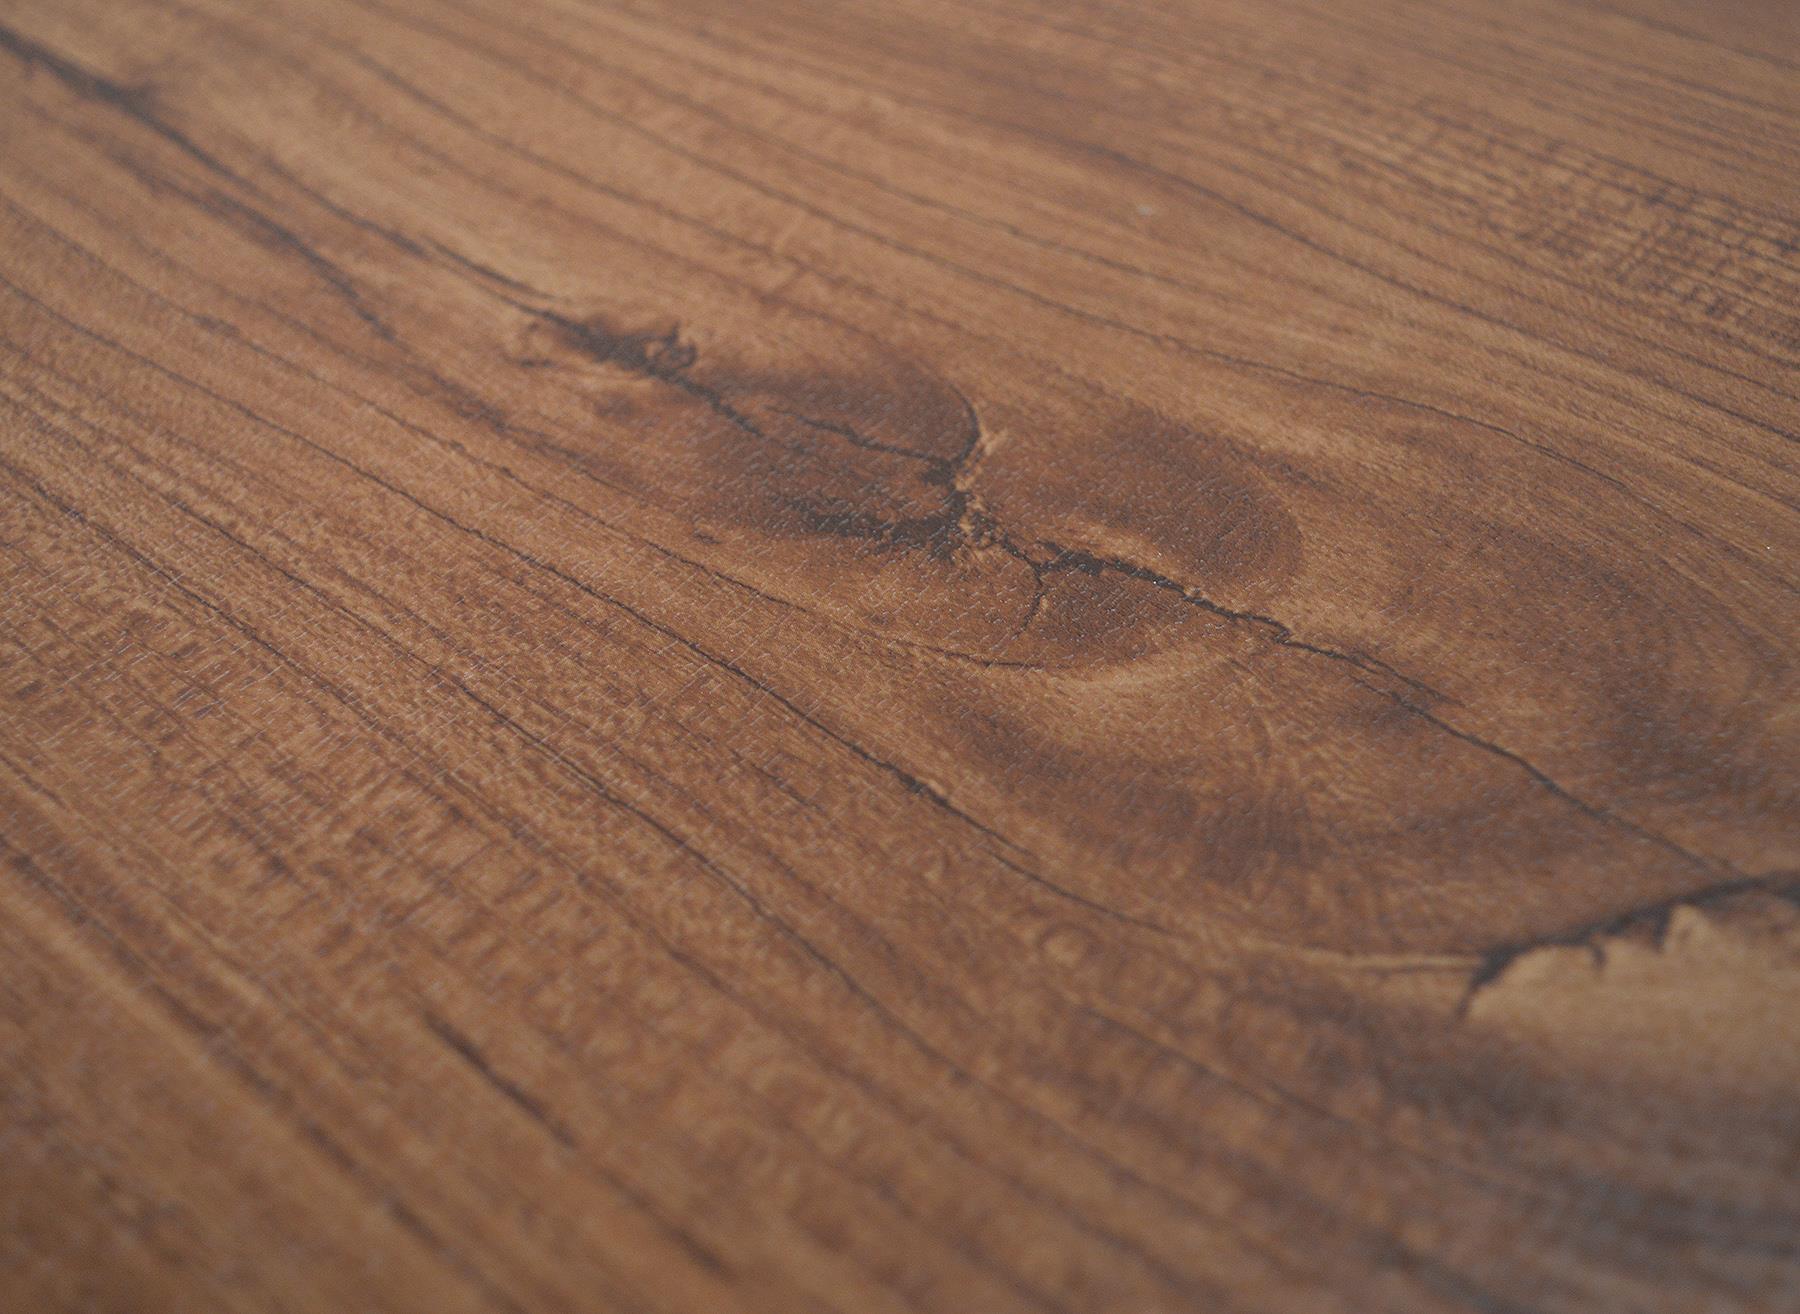 Floor-Tiles-Self-Adhesive-Vinyl-Flooring-Kitchen-Bathroom-Brown-Wood-Grain thumbnail 19